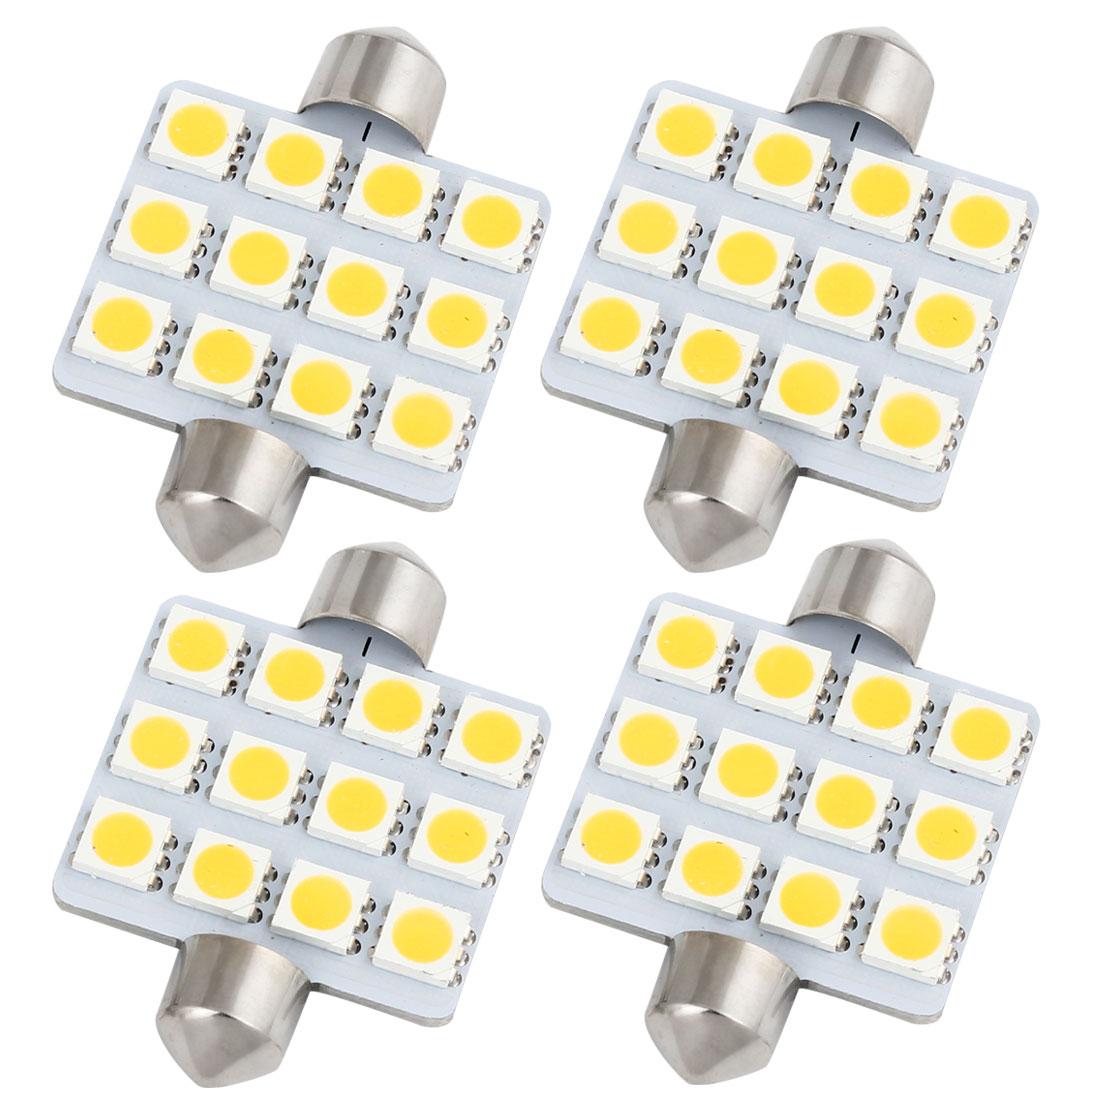 4Pcs 42mm 12-SMD 5050 LED Warm White Festoon Dome Light Bulbs 560 212-2 Internal